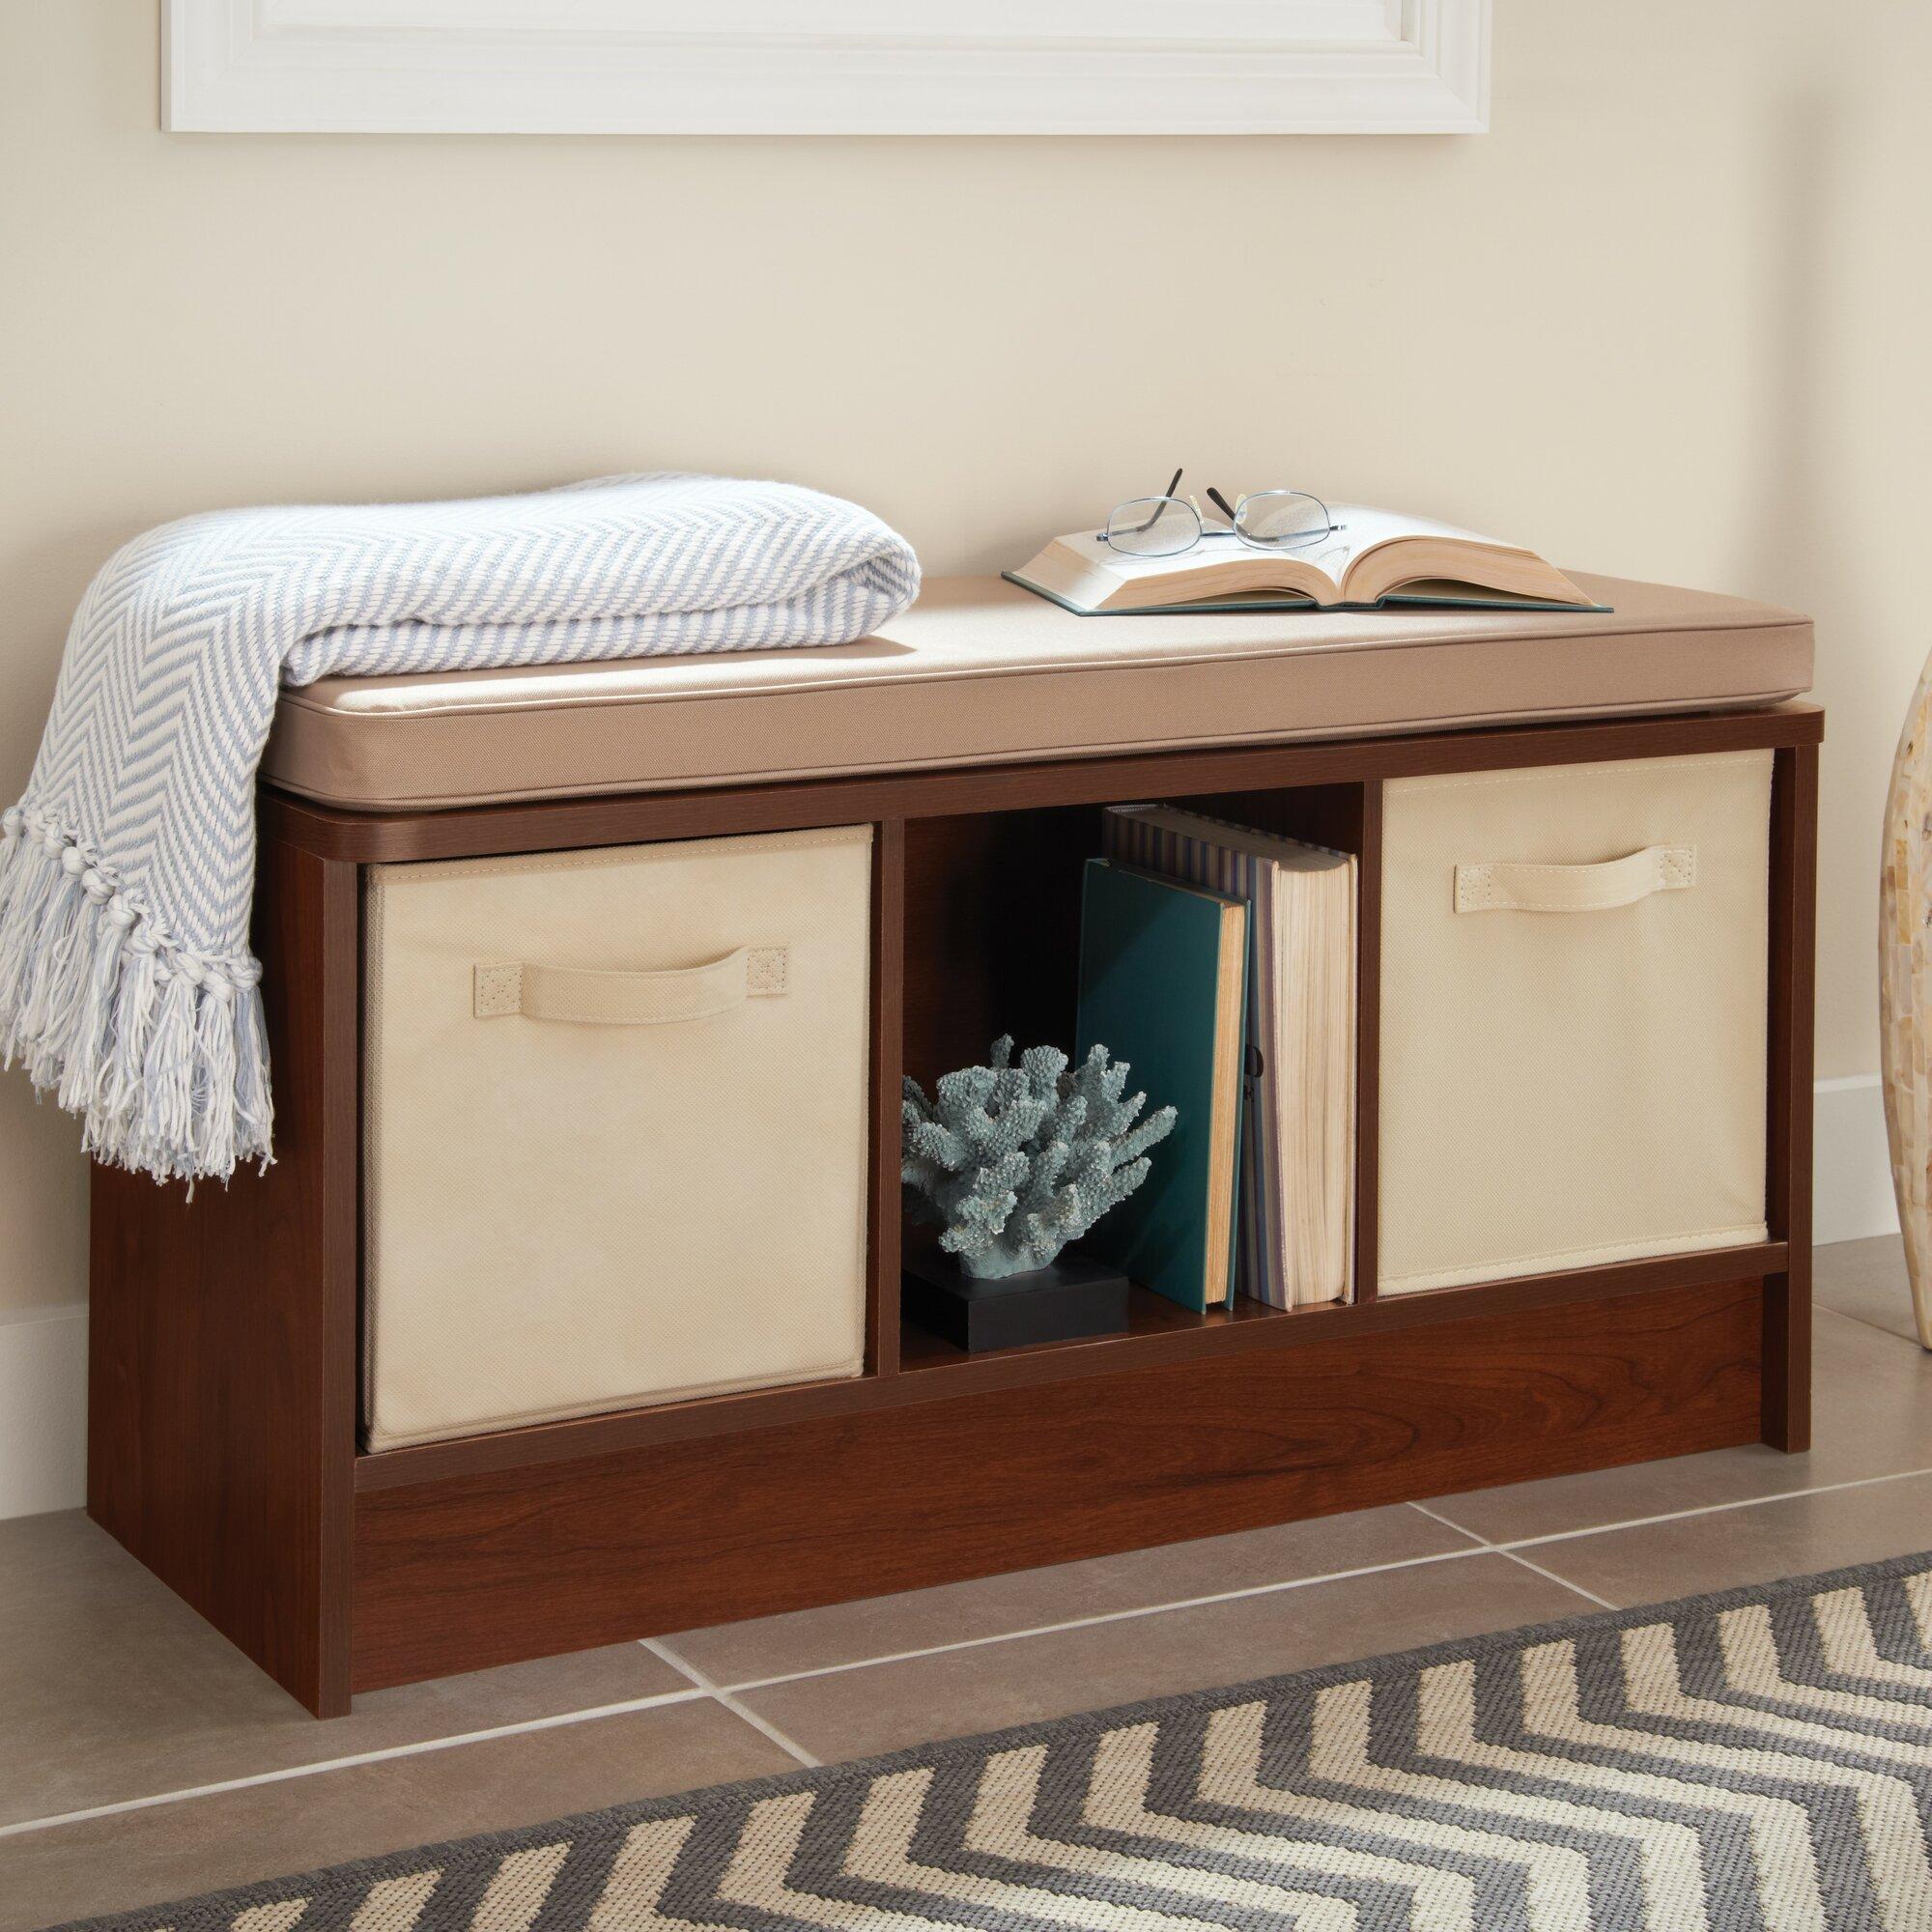 Closetmaid Cubeicals Upholstered Storage Entryway Bench Ebay